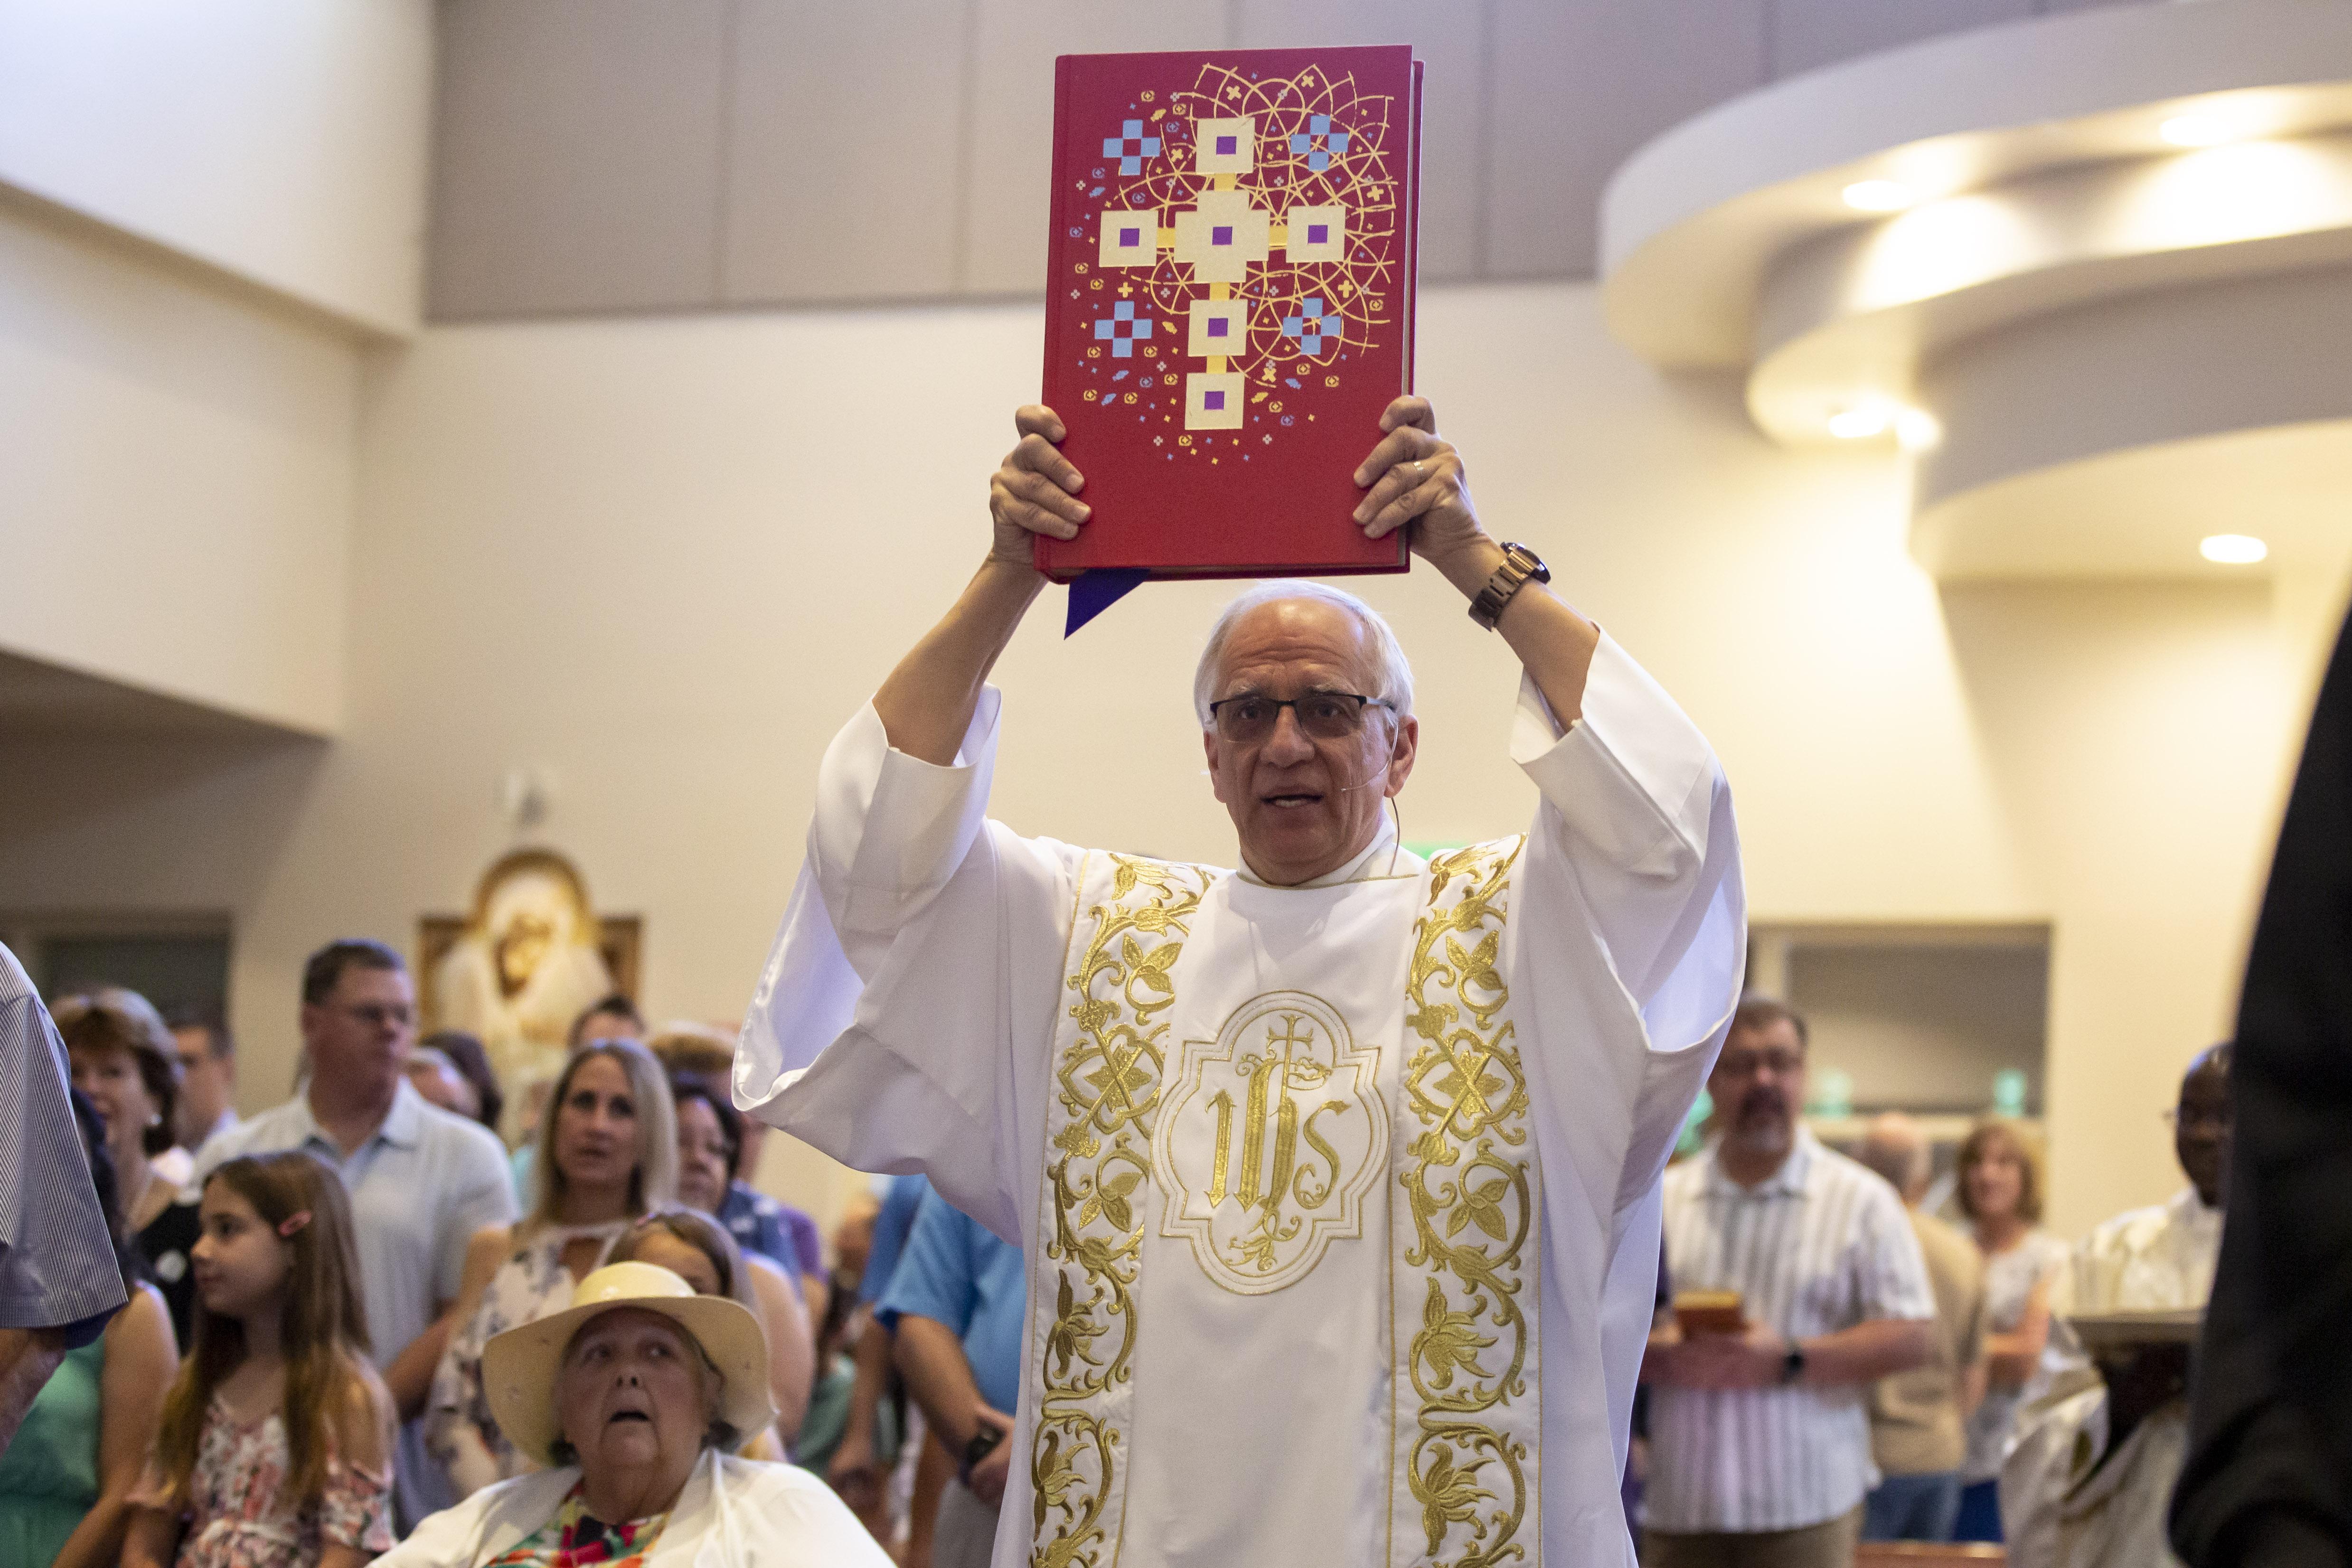 The Mass Liturgy Of The Word